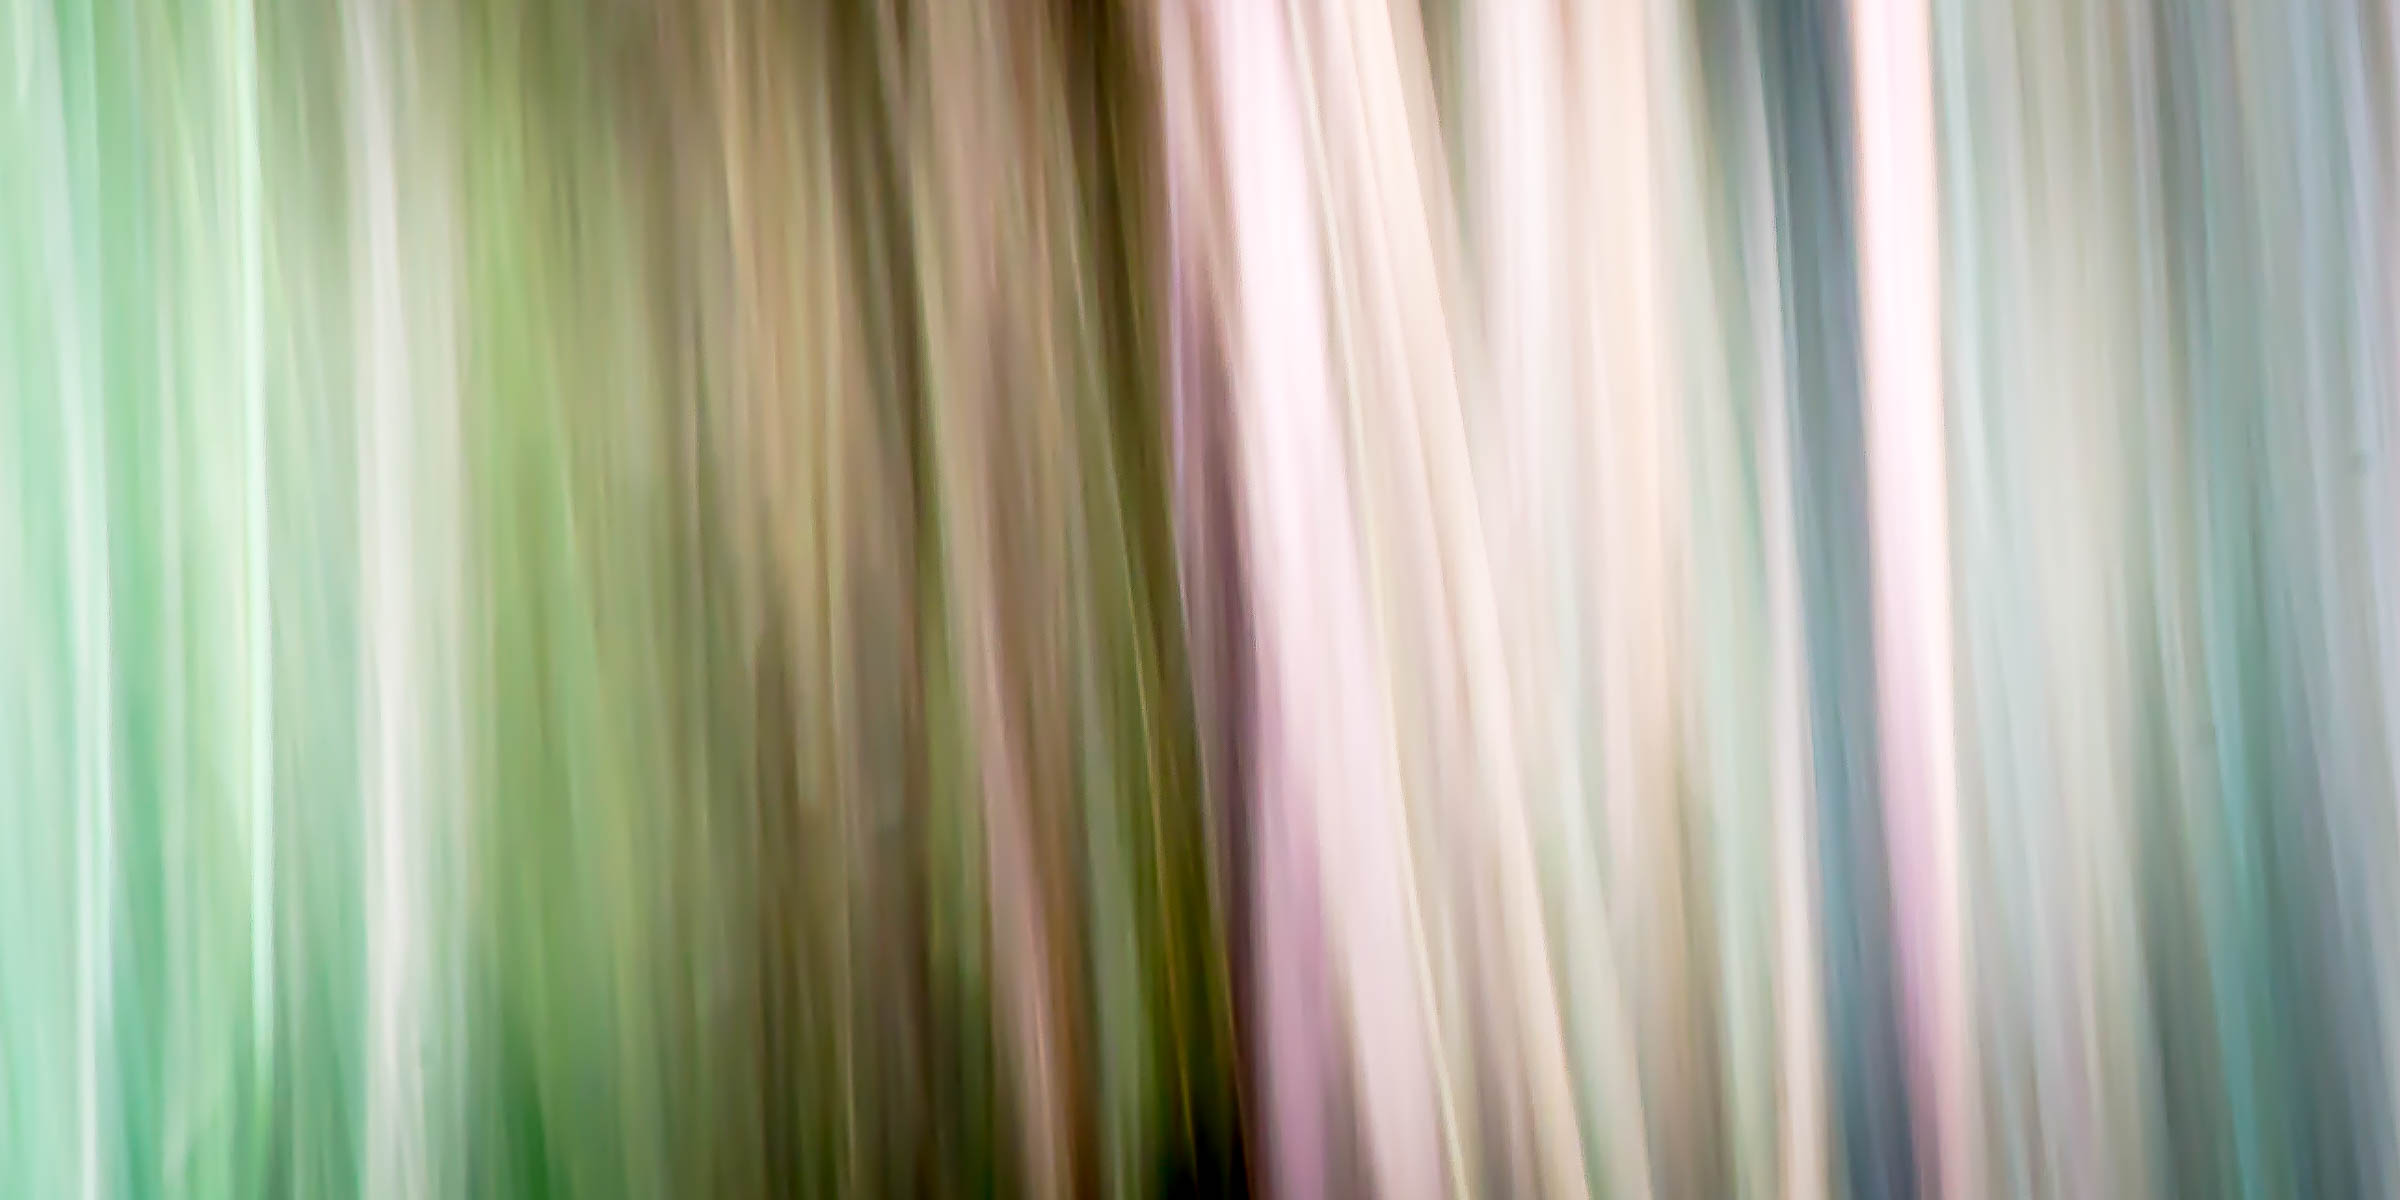 _MGL8533-2_Woodland Pastels.jpg